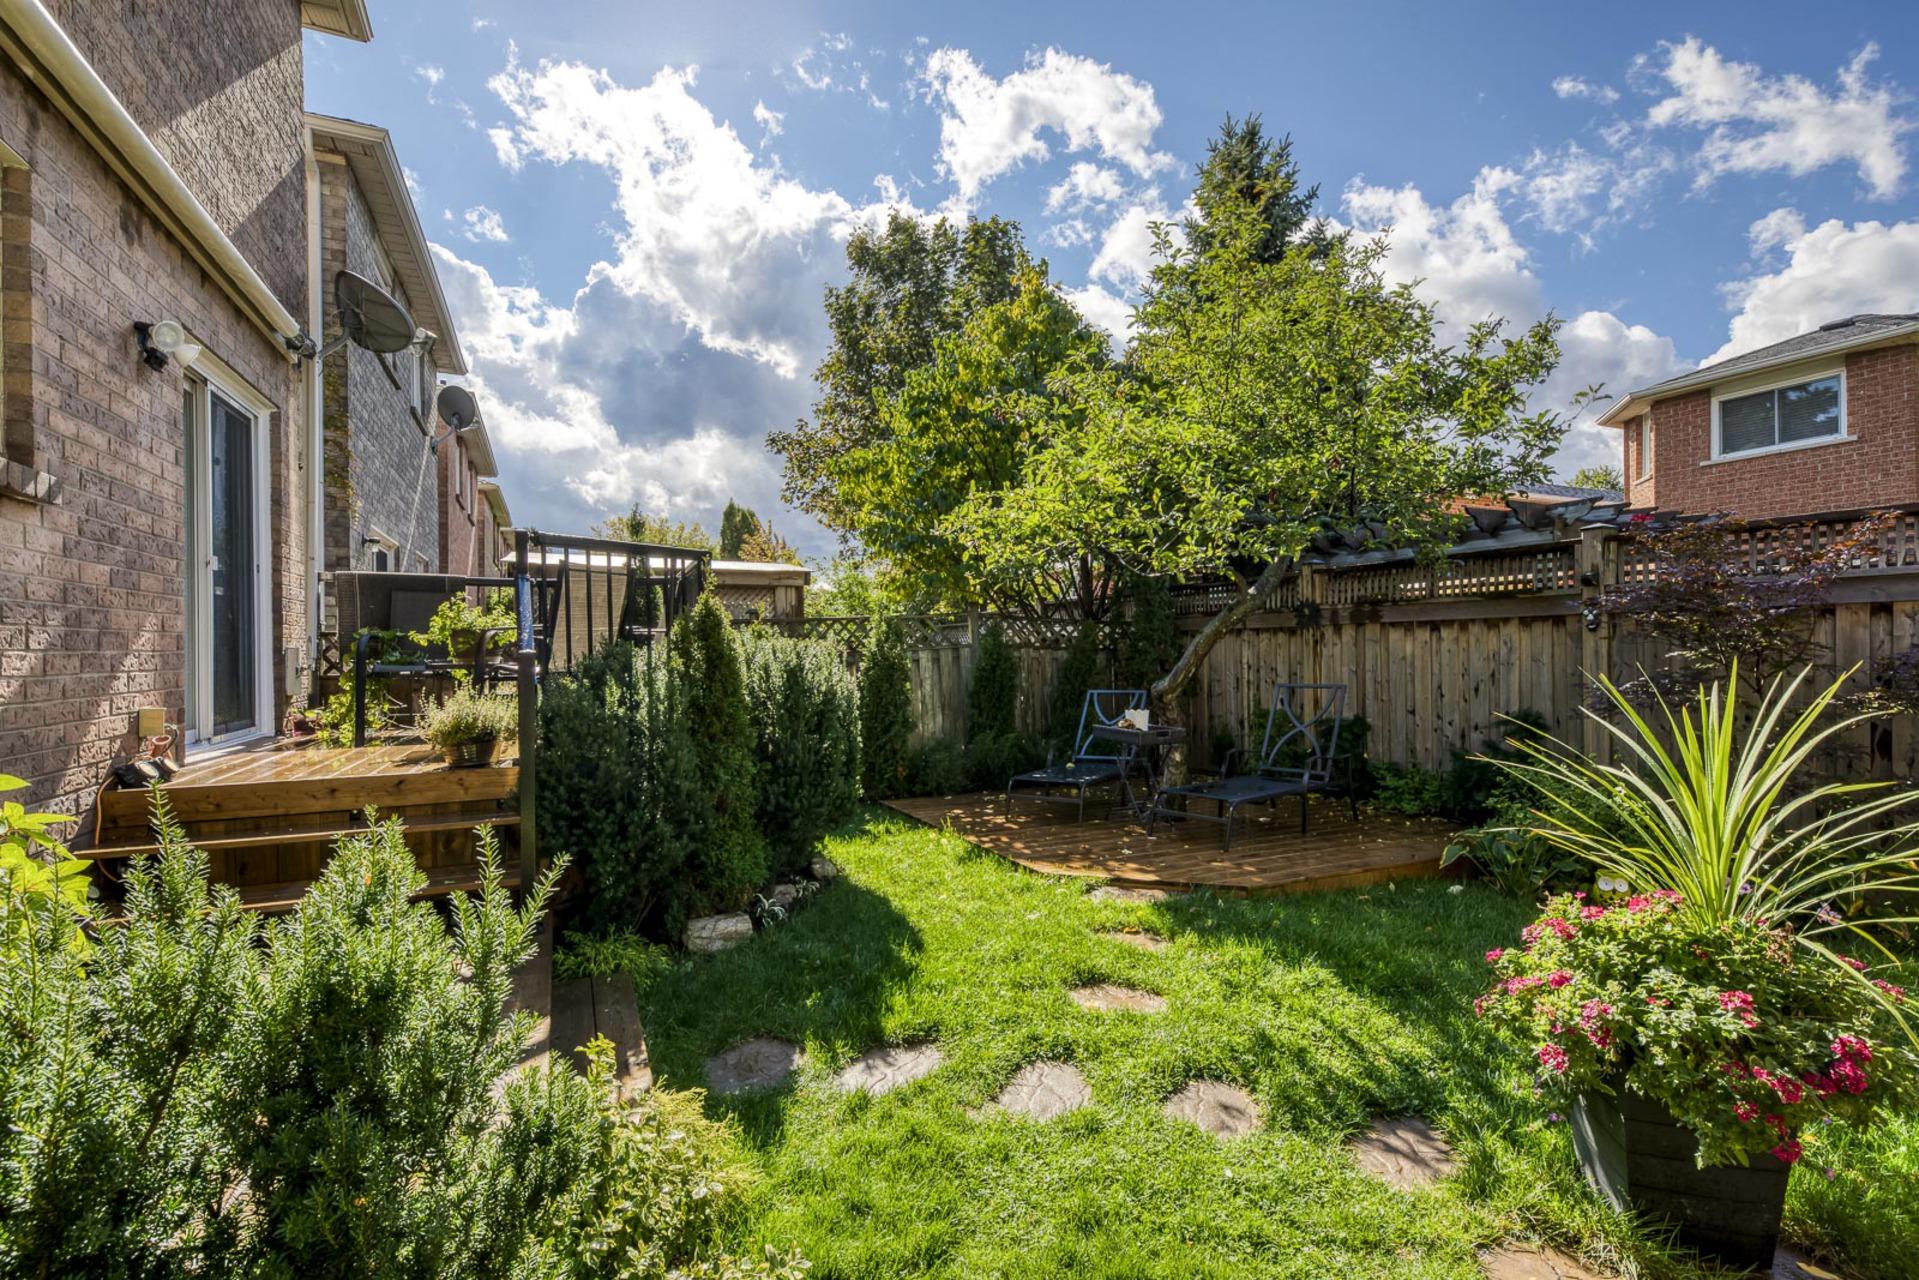 Backyard - 1308 Valerie Cres, Oakville - Elite3 & Team at 1308 Valerie Crescent, Clearview, Oakville